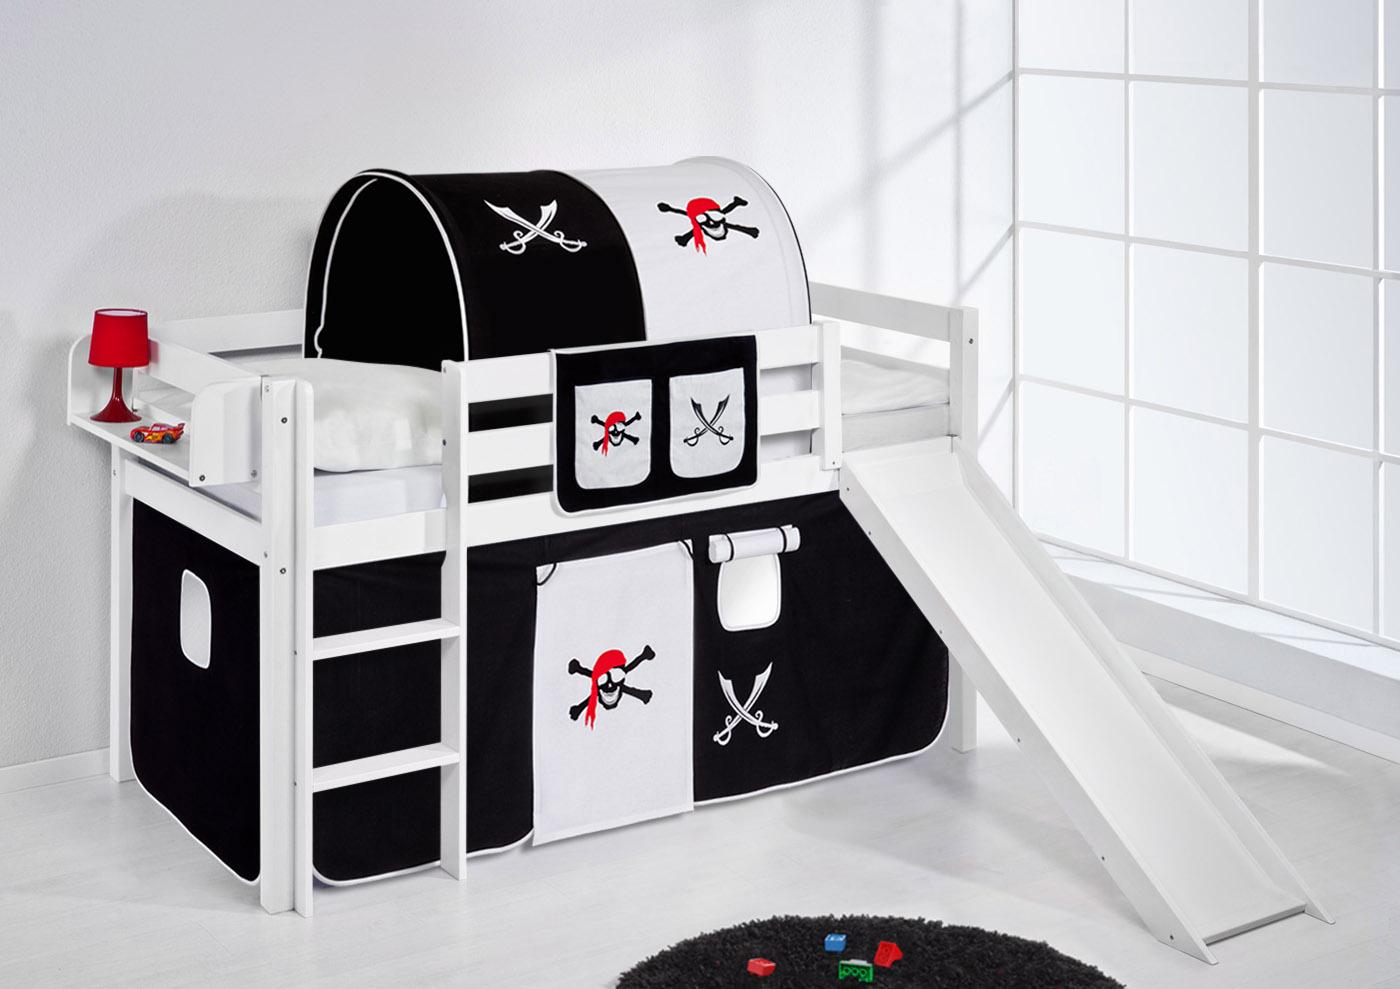 lit demi mezzanine. Black Bedroom Furniture Sets. Home Design Ideas